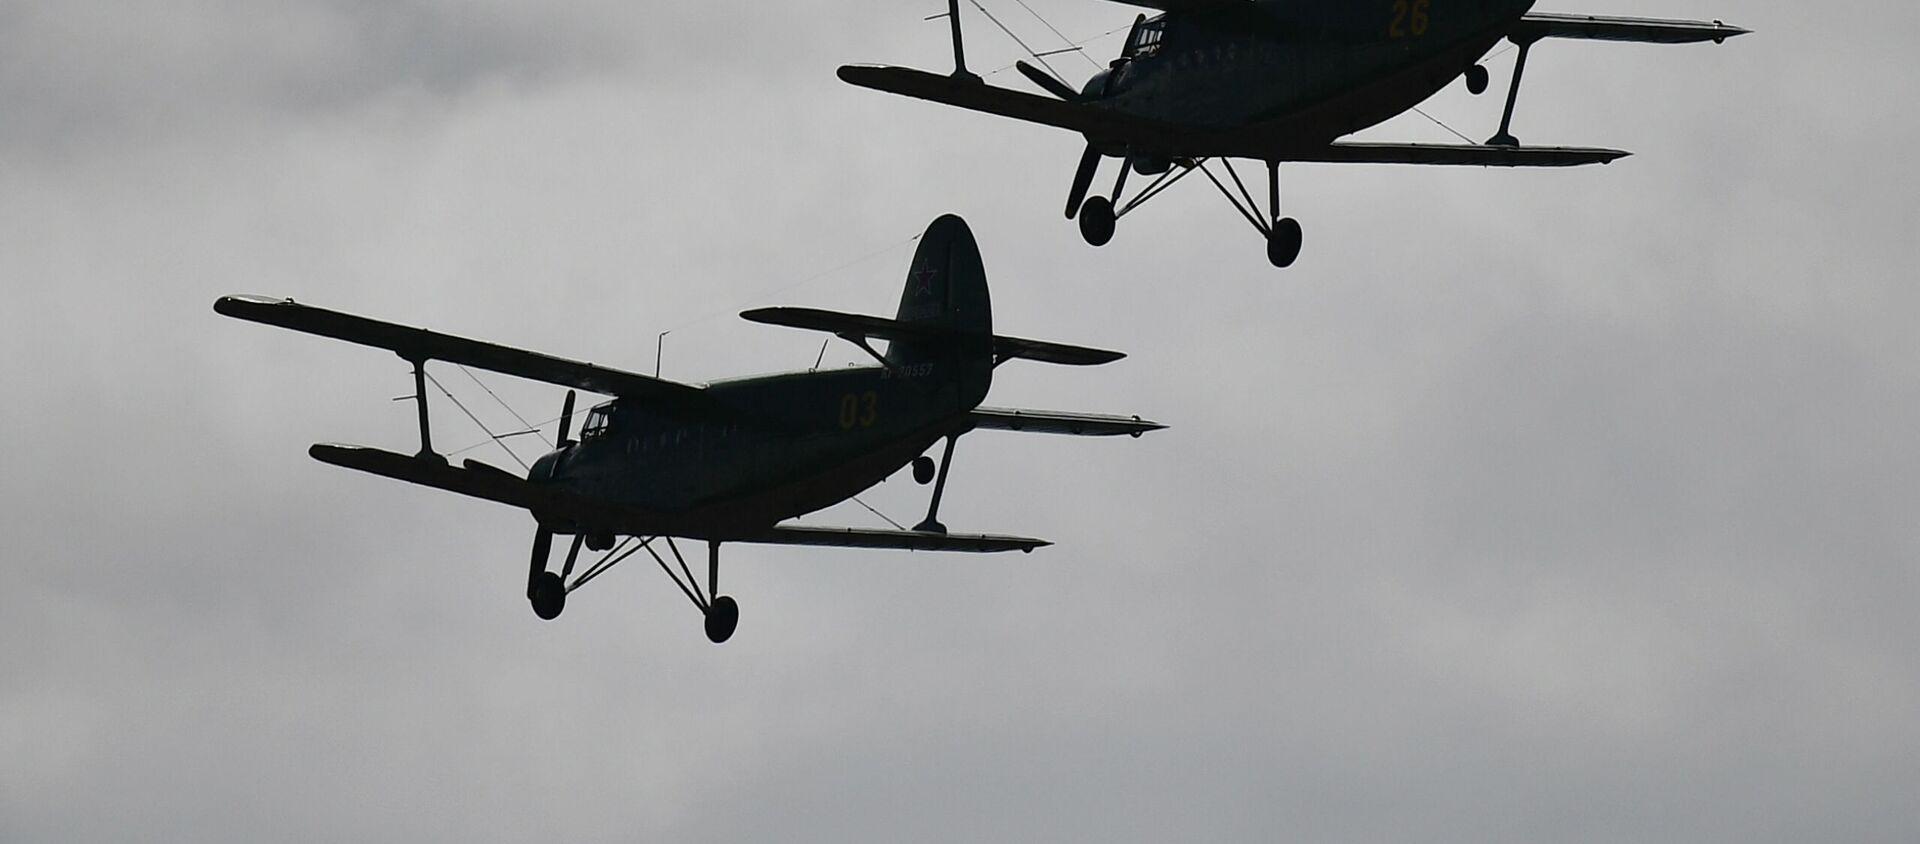 Самолеты Ан-2 (кукурузник) - Sputnik Беларусь, 1920, 27.02.2021